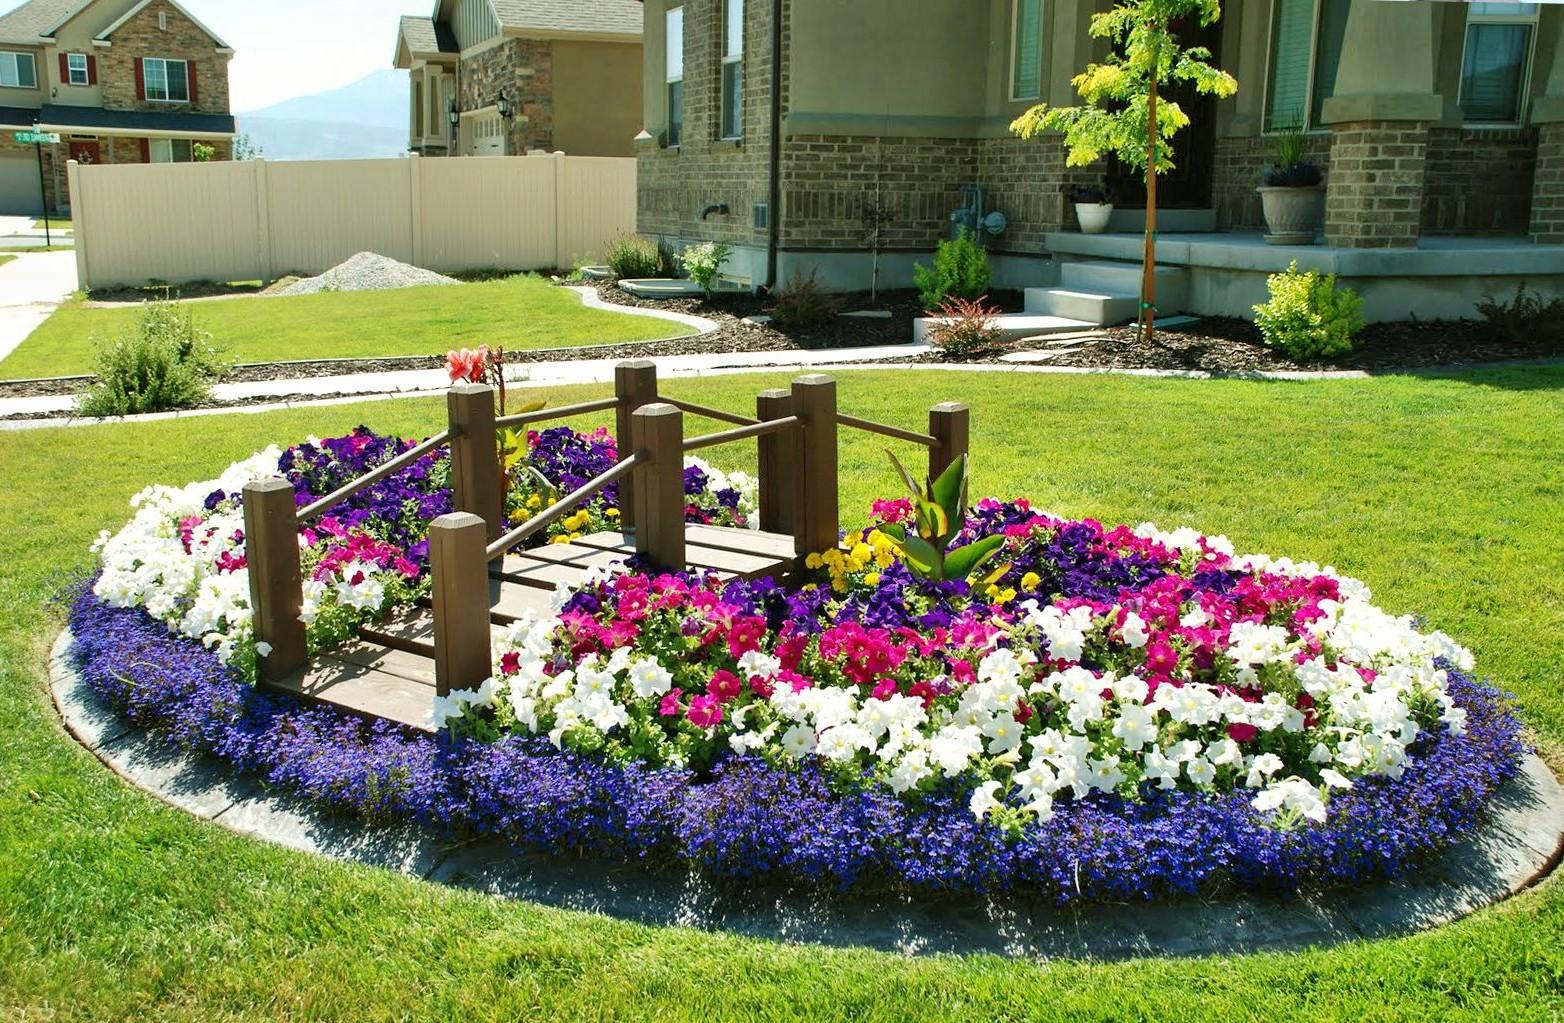 Клумба с цветами во дворе частного дома